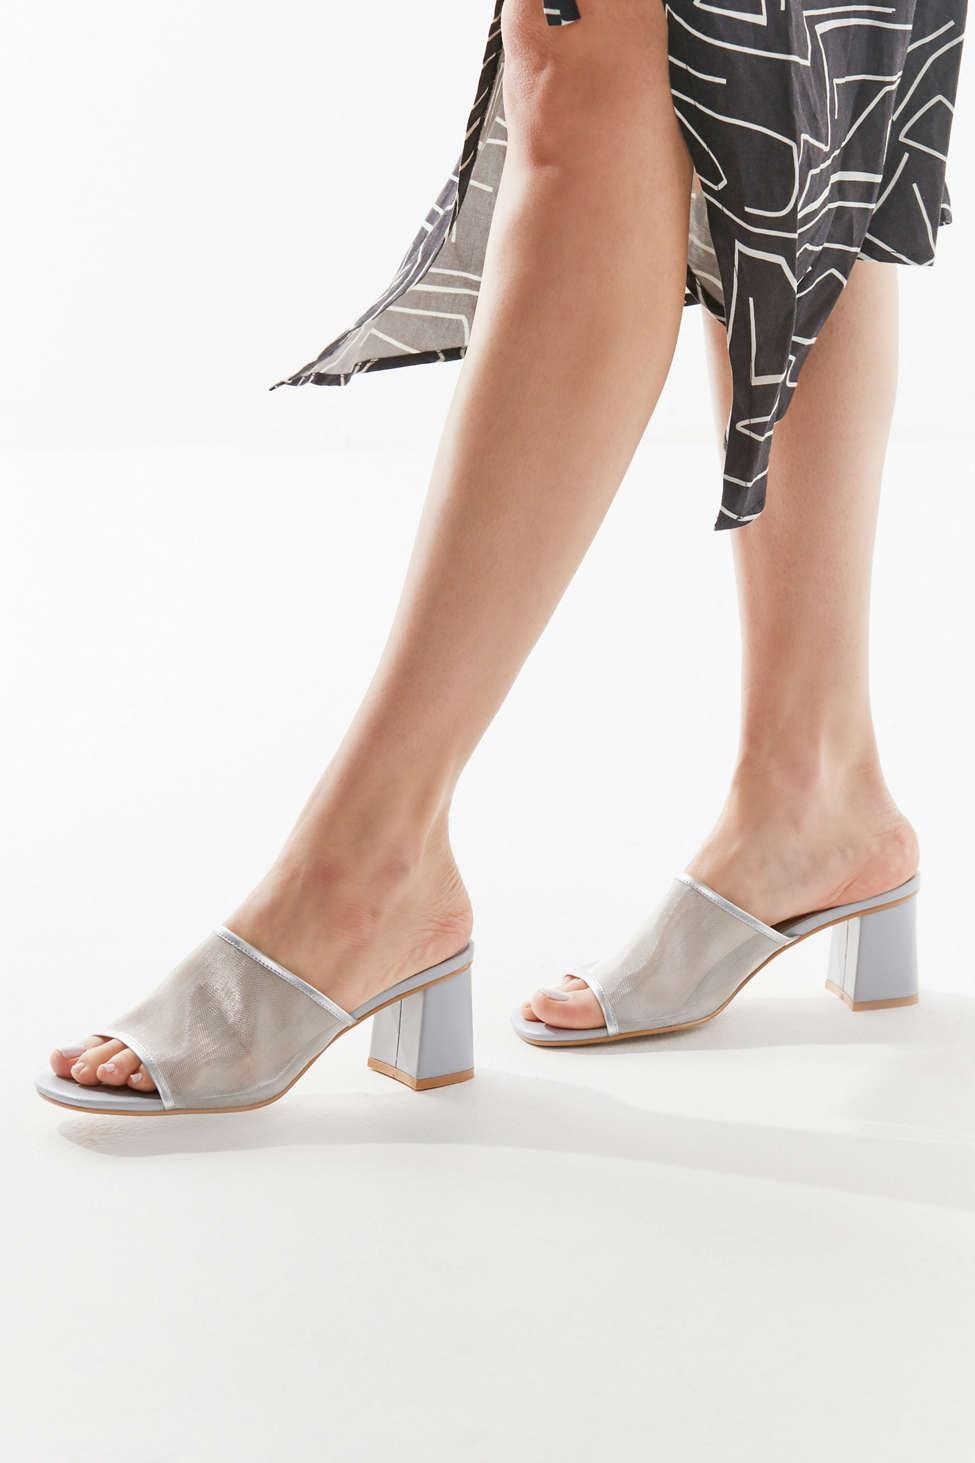 35d7ae55c583d7 Lyst - Urban Outfitters Uo Amanda Mesh Mule Sandal in Metallic